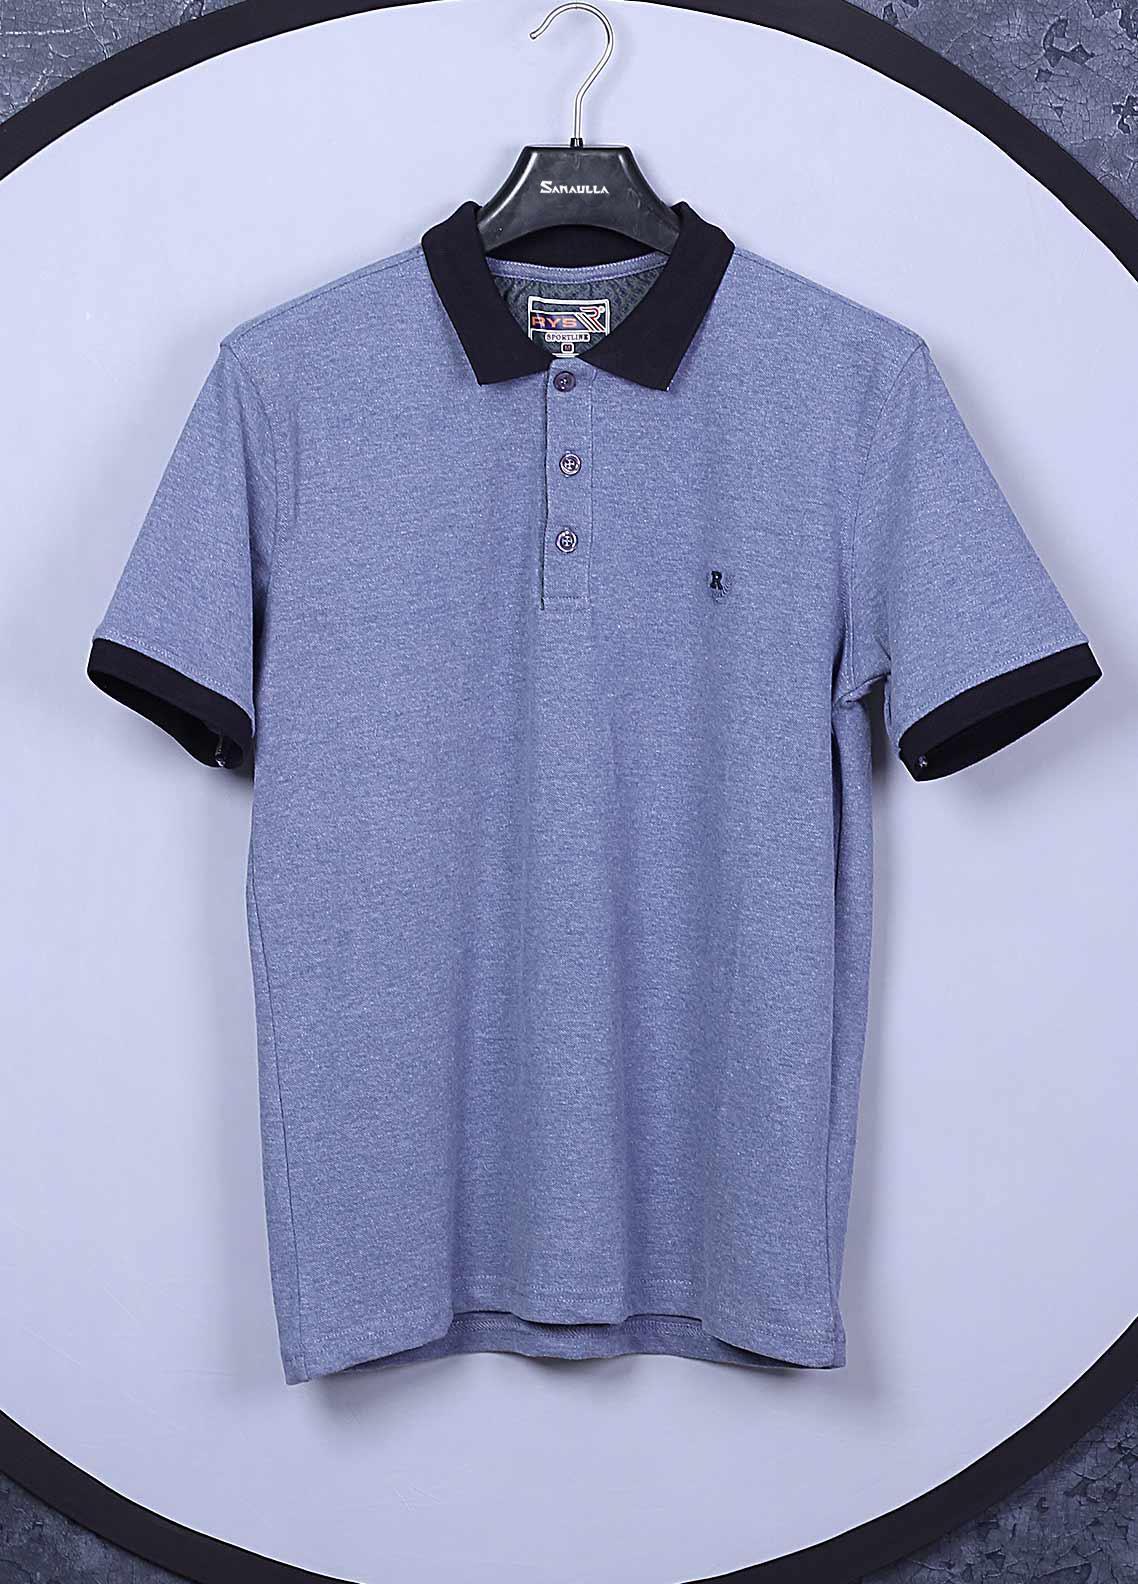 Sanaulla Exclusive Range Cotton Casual T-Shirts for Mens -  5326 Sky Blue